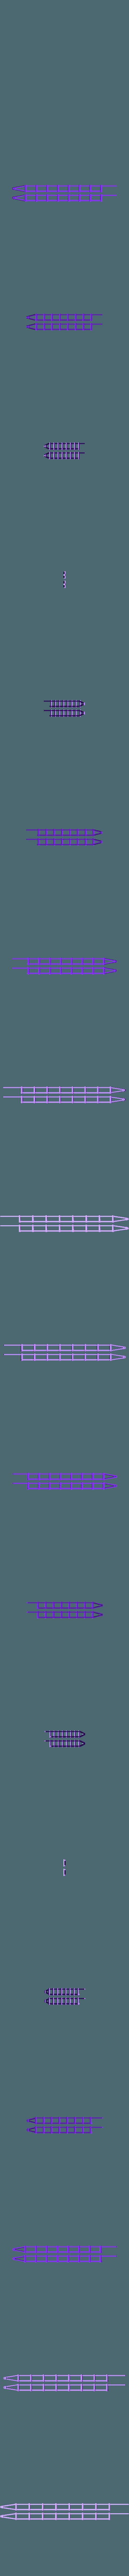 Track_Guard_Rails.stl Download free STL file HO Scale 145 ft Steel Arched Truss Bridge • 3D printer model, kabrumble